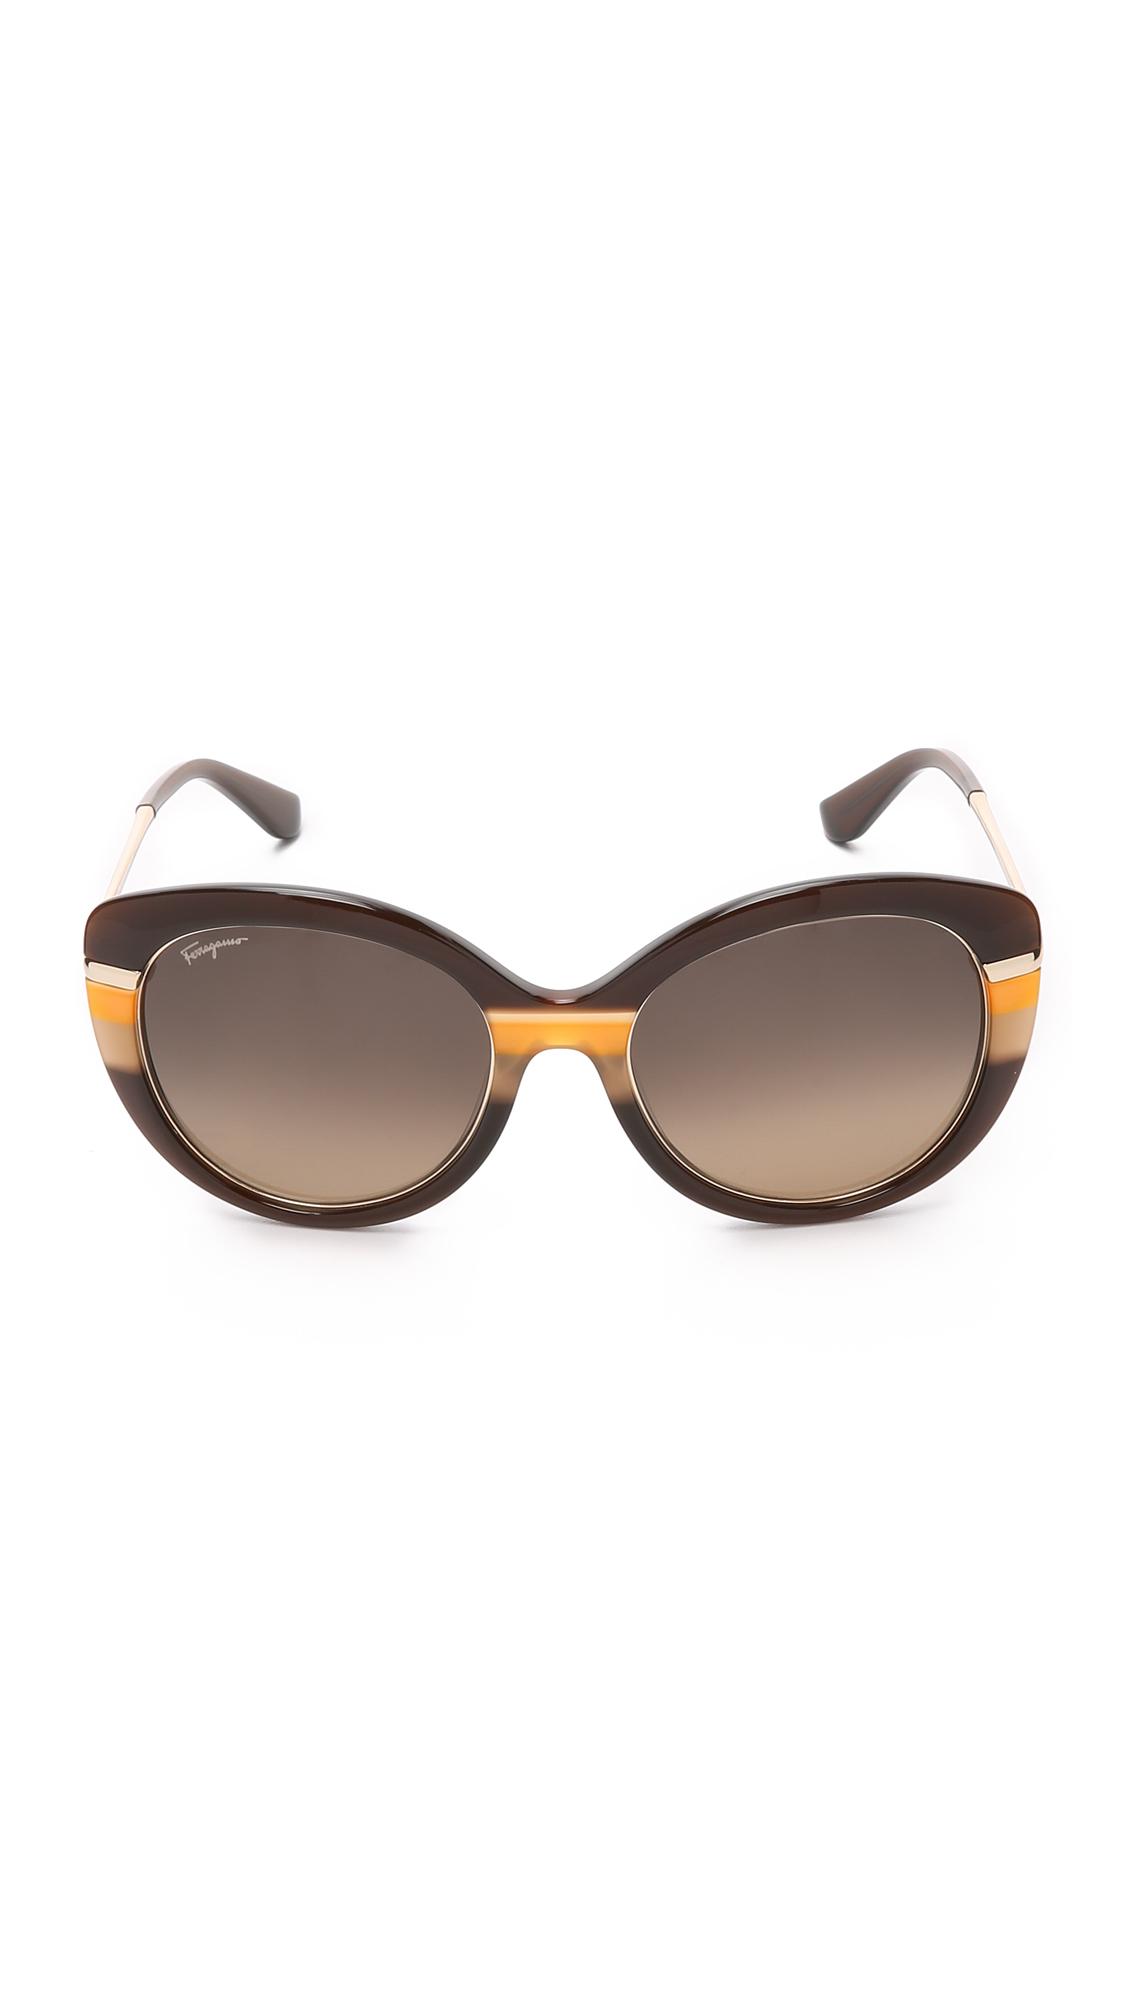 Ferragamo Cat Eye Sunglasses In Brown